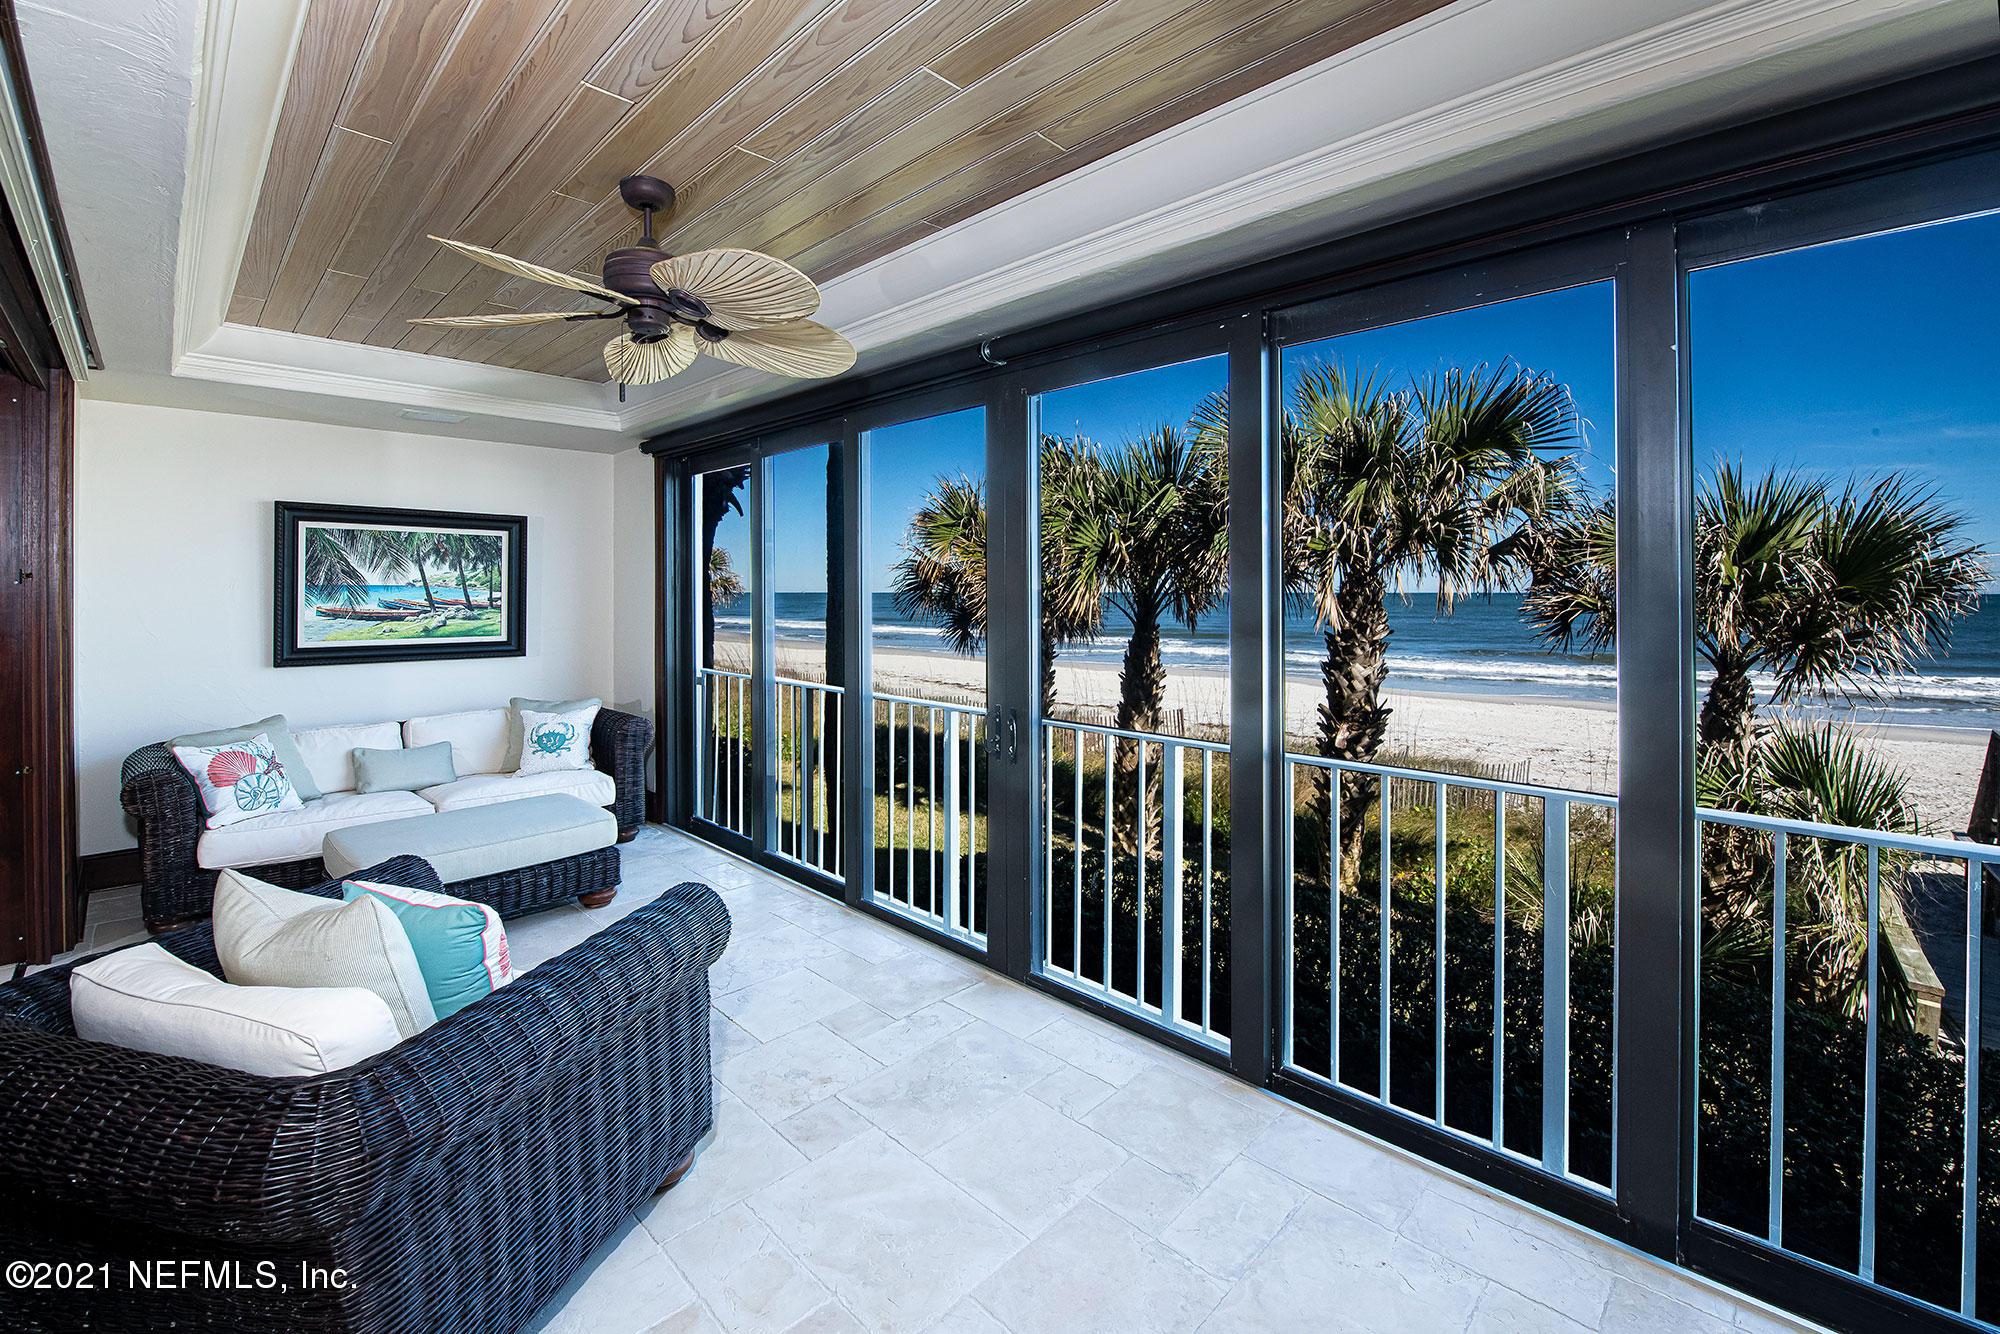 611 PONTE VEDRA, PONTE VEDRA BEACH, FLORIDA 32082, 2 Bedrooms Bedrooms, ,2 BathroomsBathrooms,Residential,For sale,PONTE VEDRA,1089218